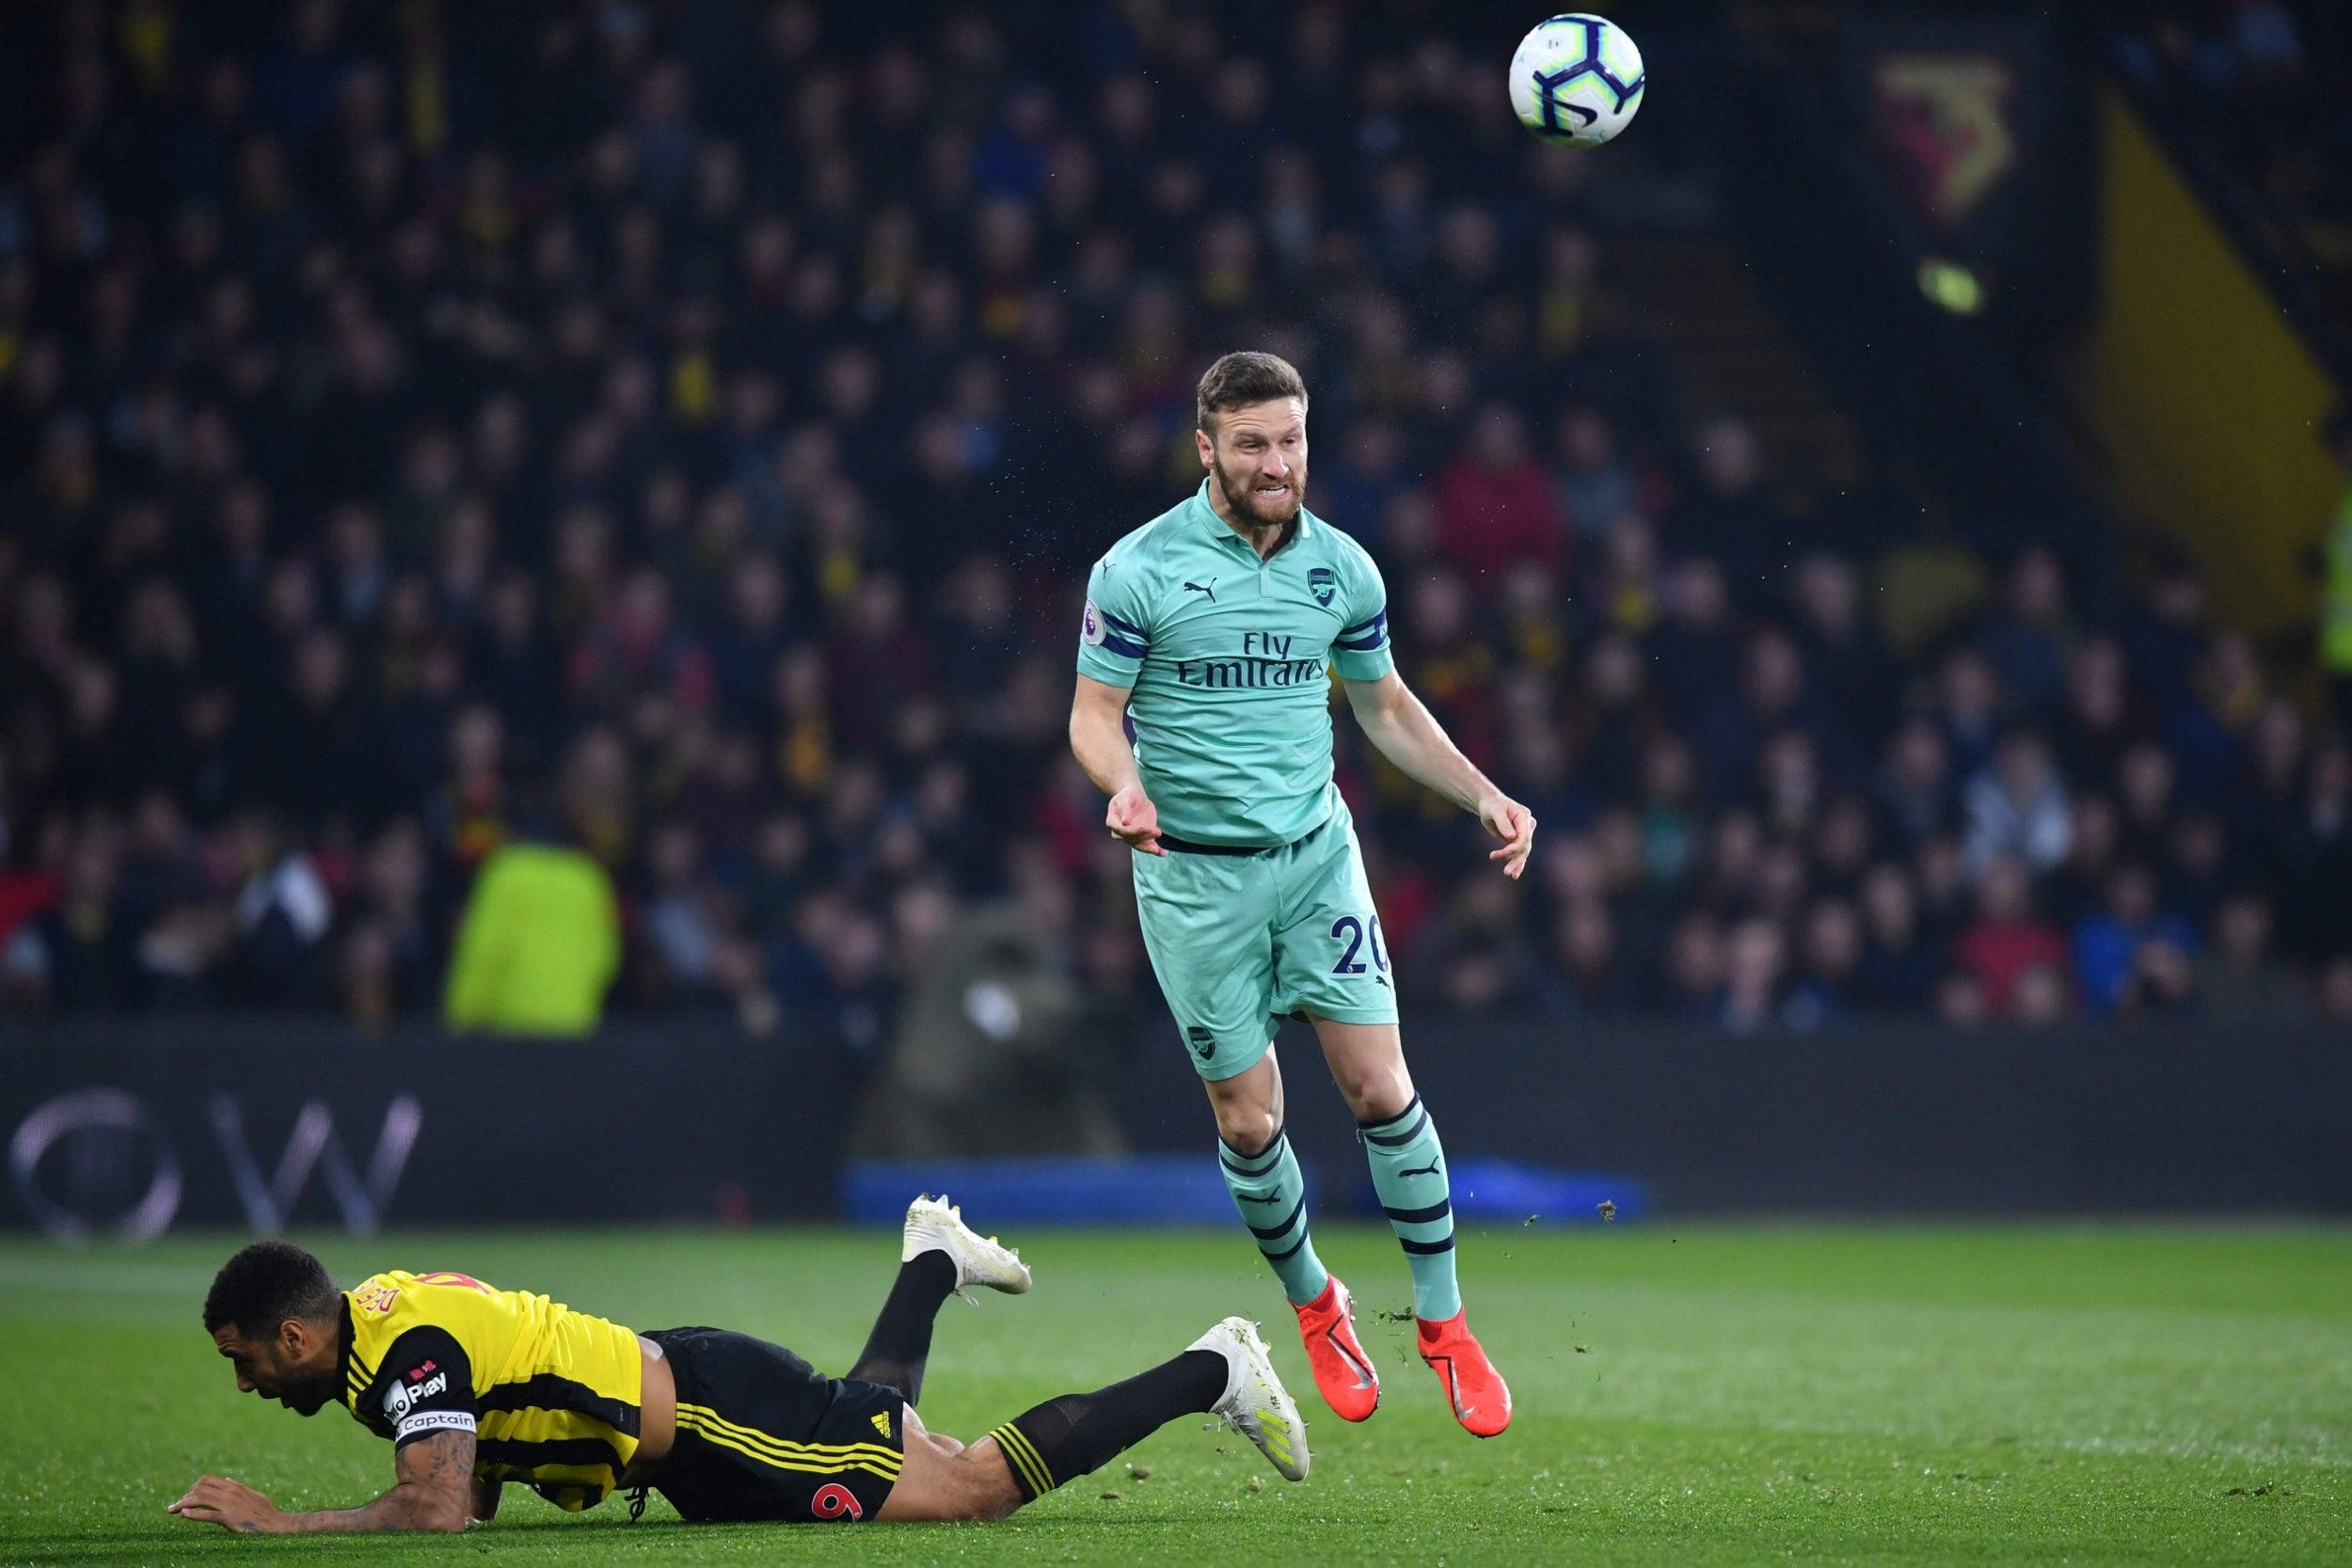 Watford Vs Arsenal Player Ratings Shkodran Mustafi And Alex Iwobi Impress In Crucial Win The Independent